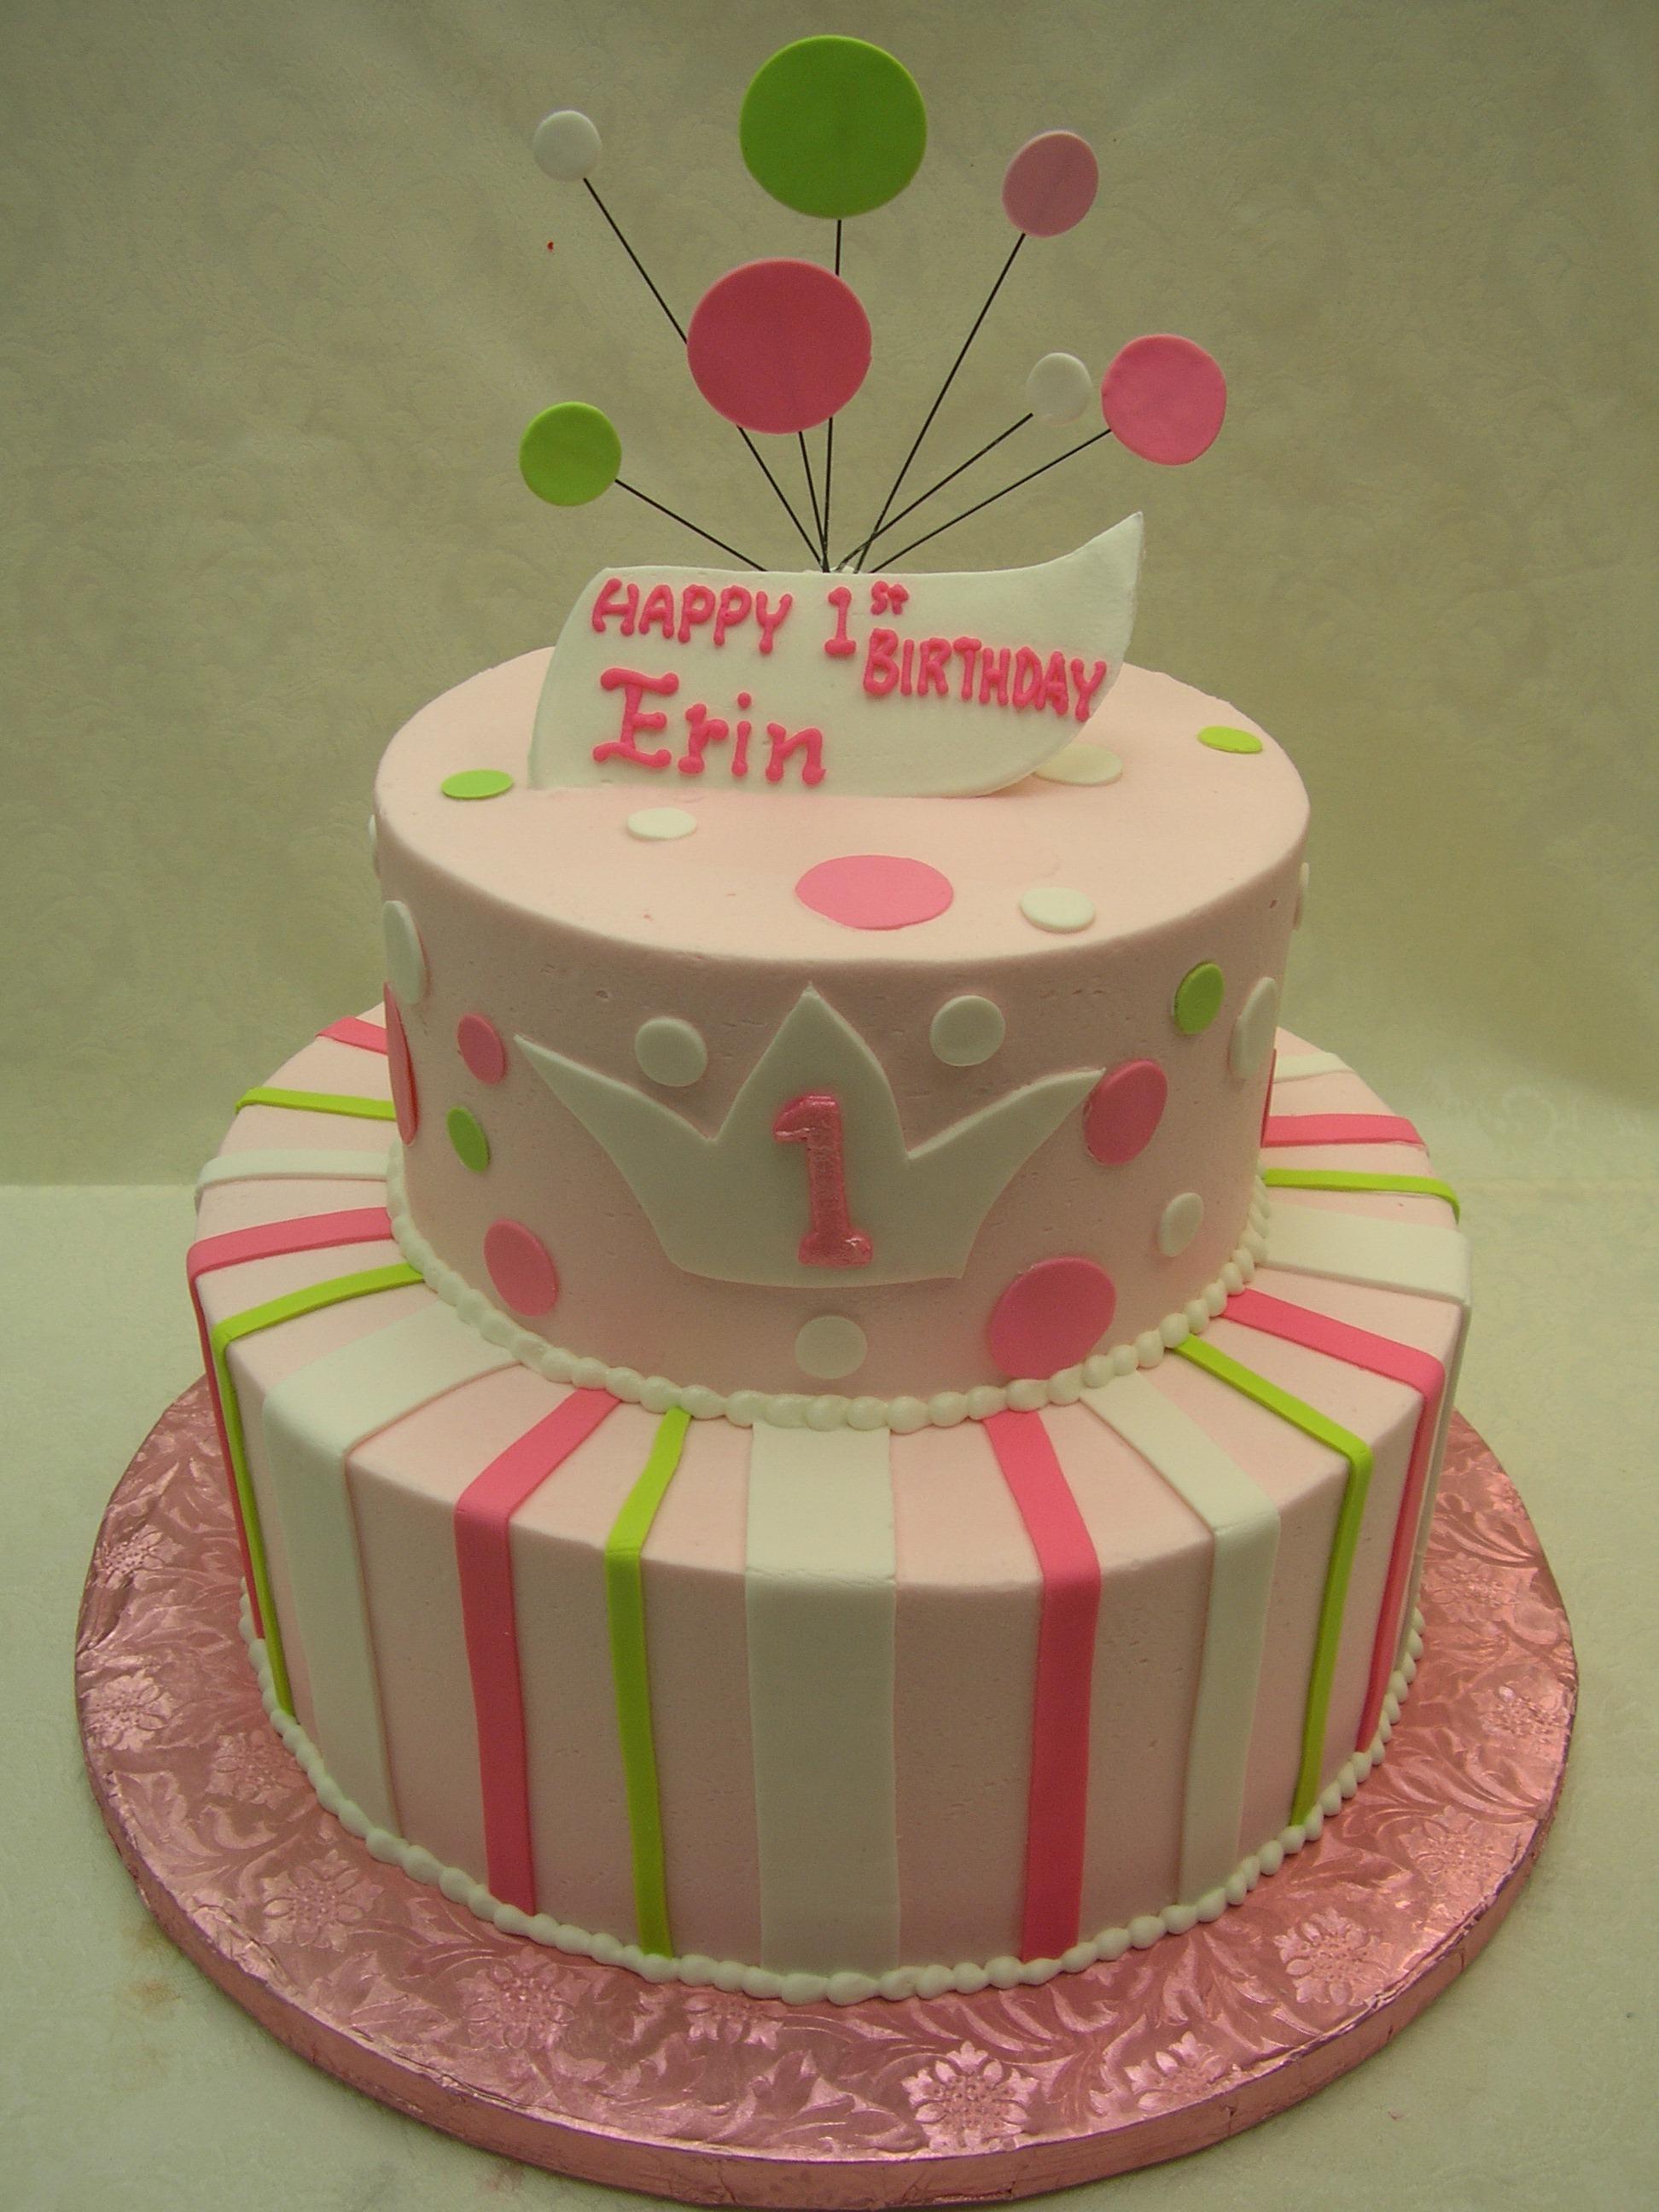 2 tier cake, polka dots, crown